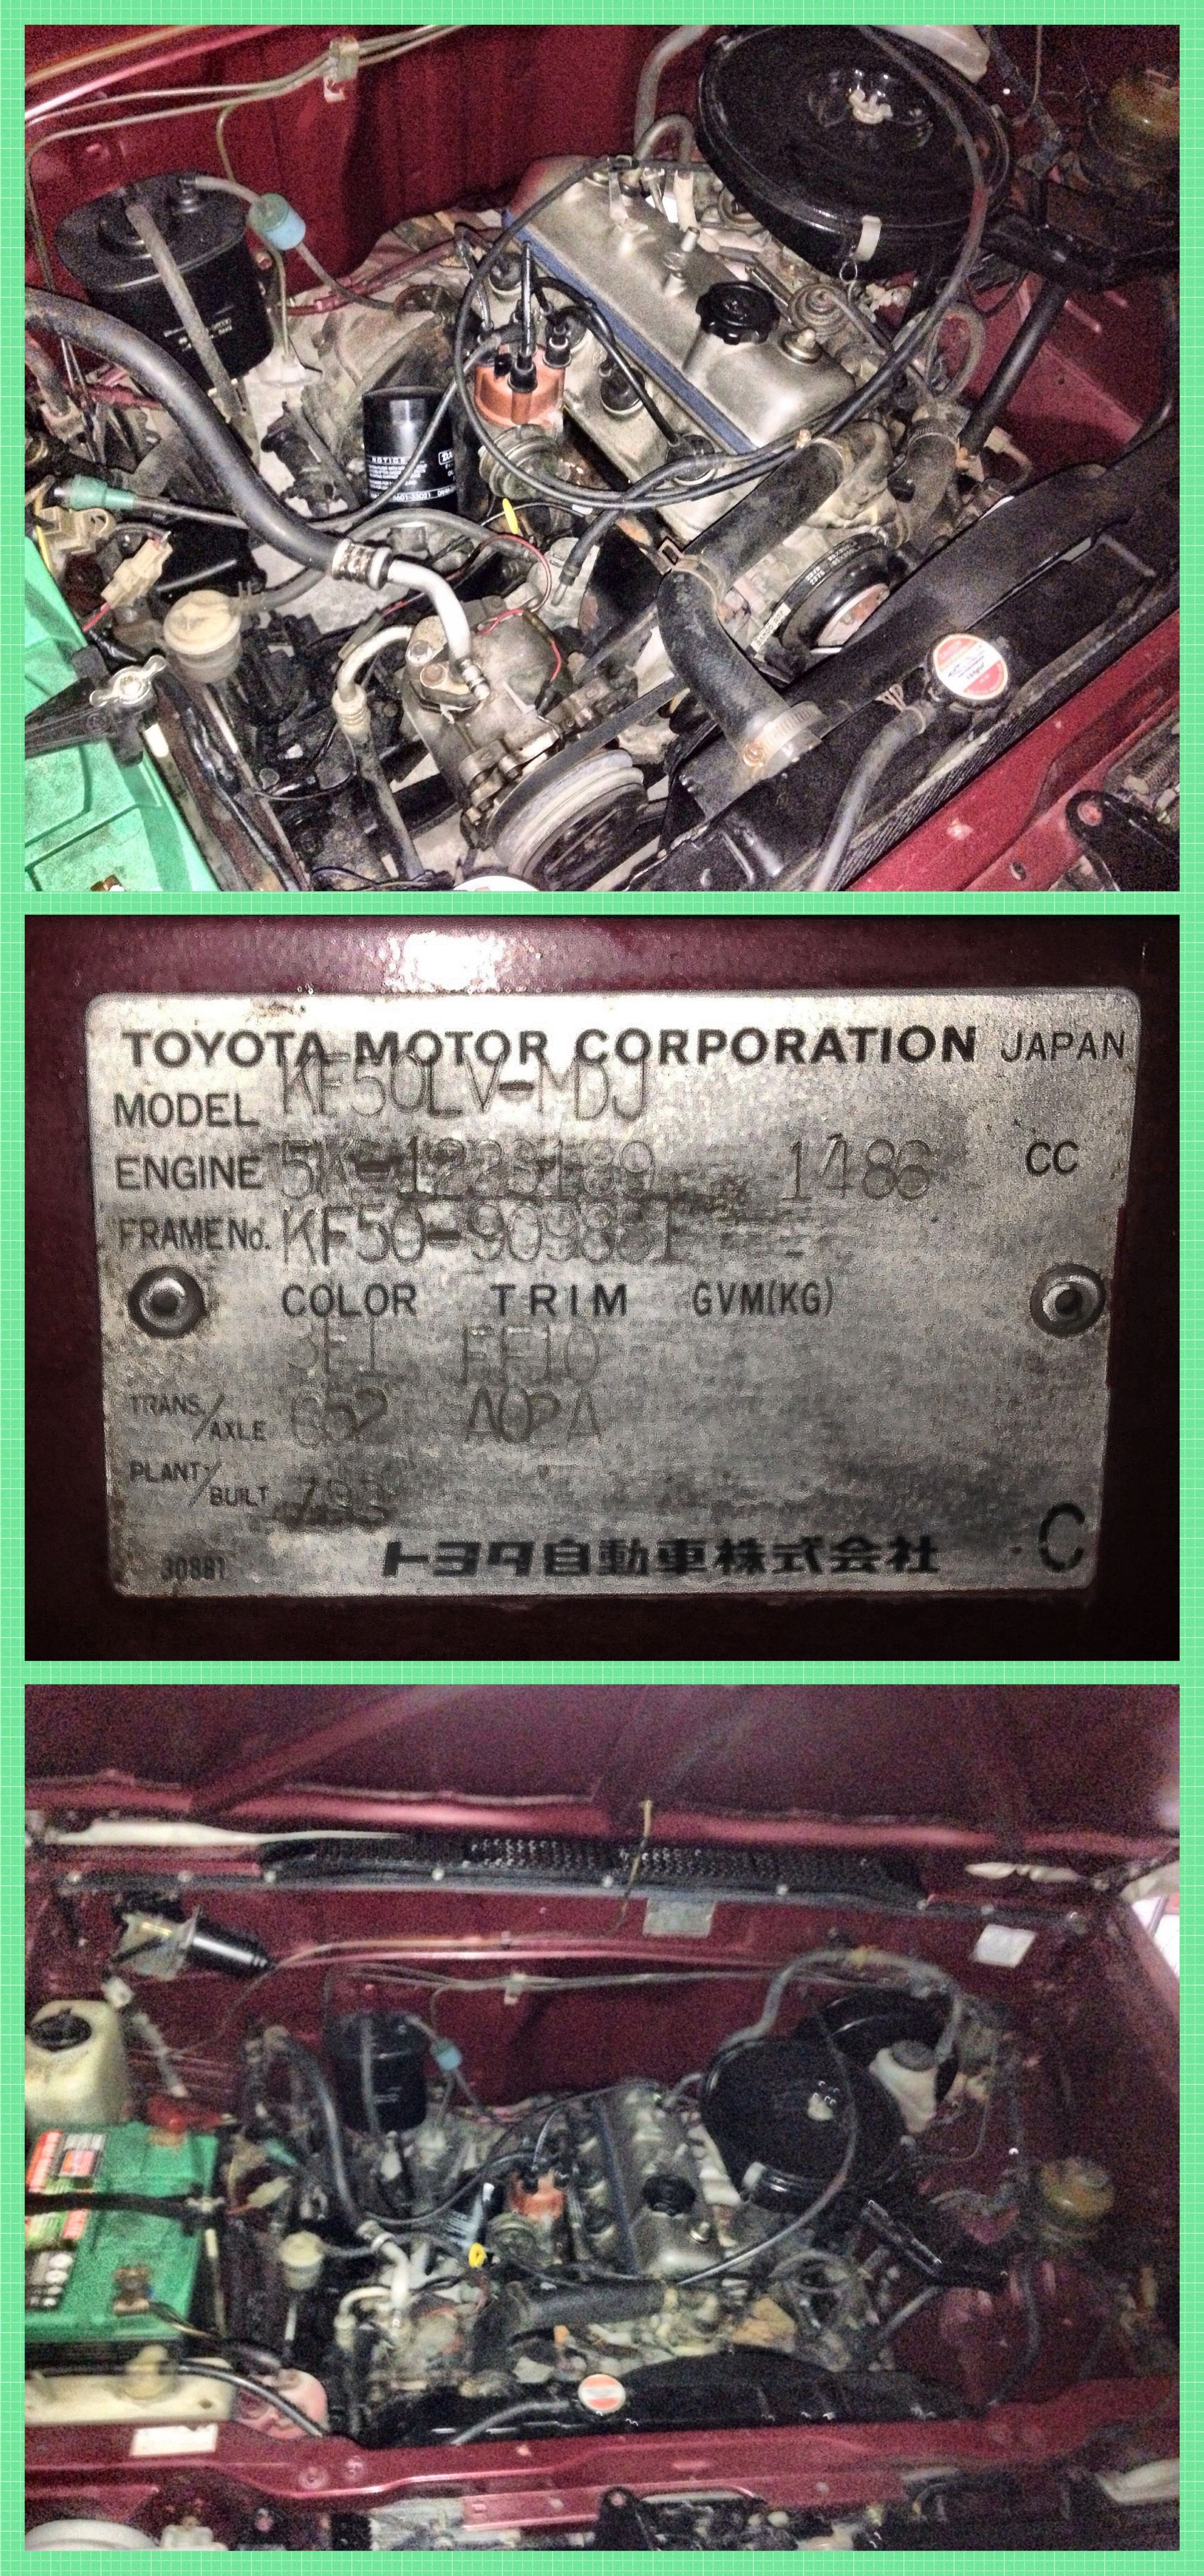 1995 toyota tamaraw fx with a 5k gasoline engine  [ 2231 x 4774 Pixel ]